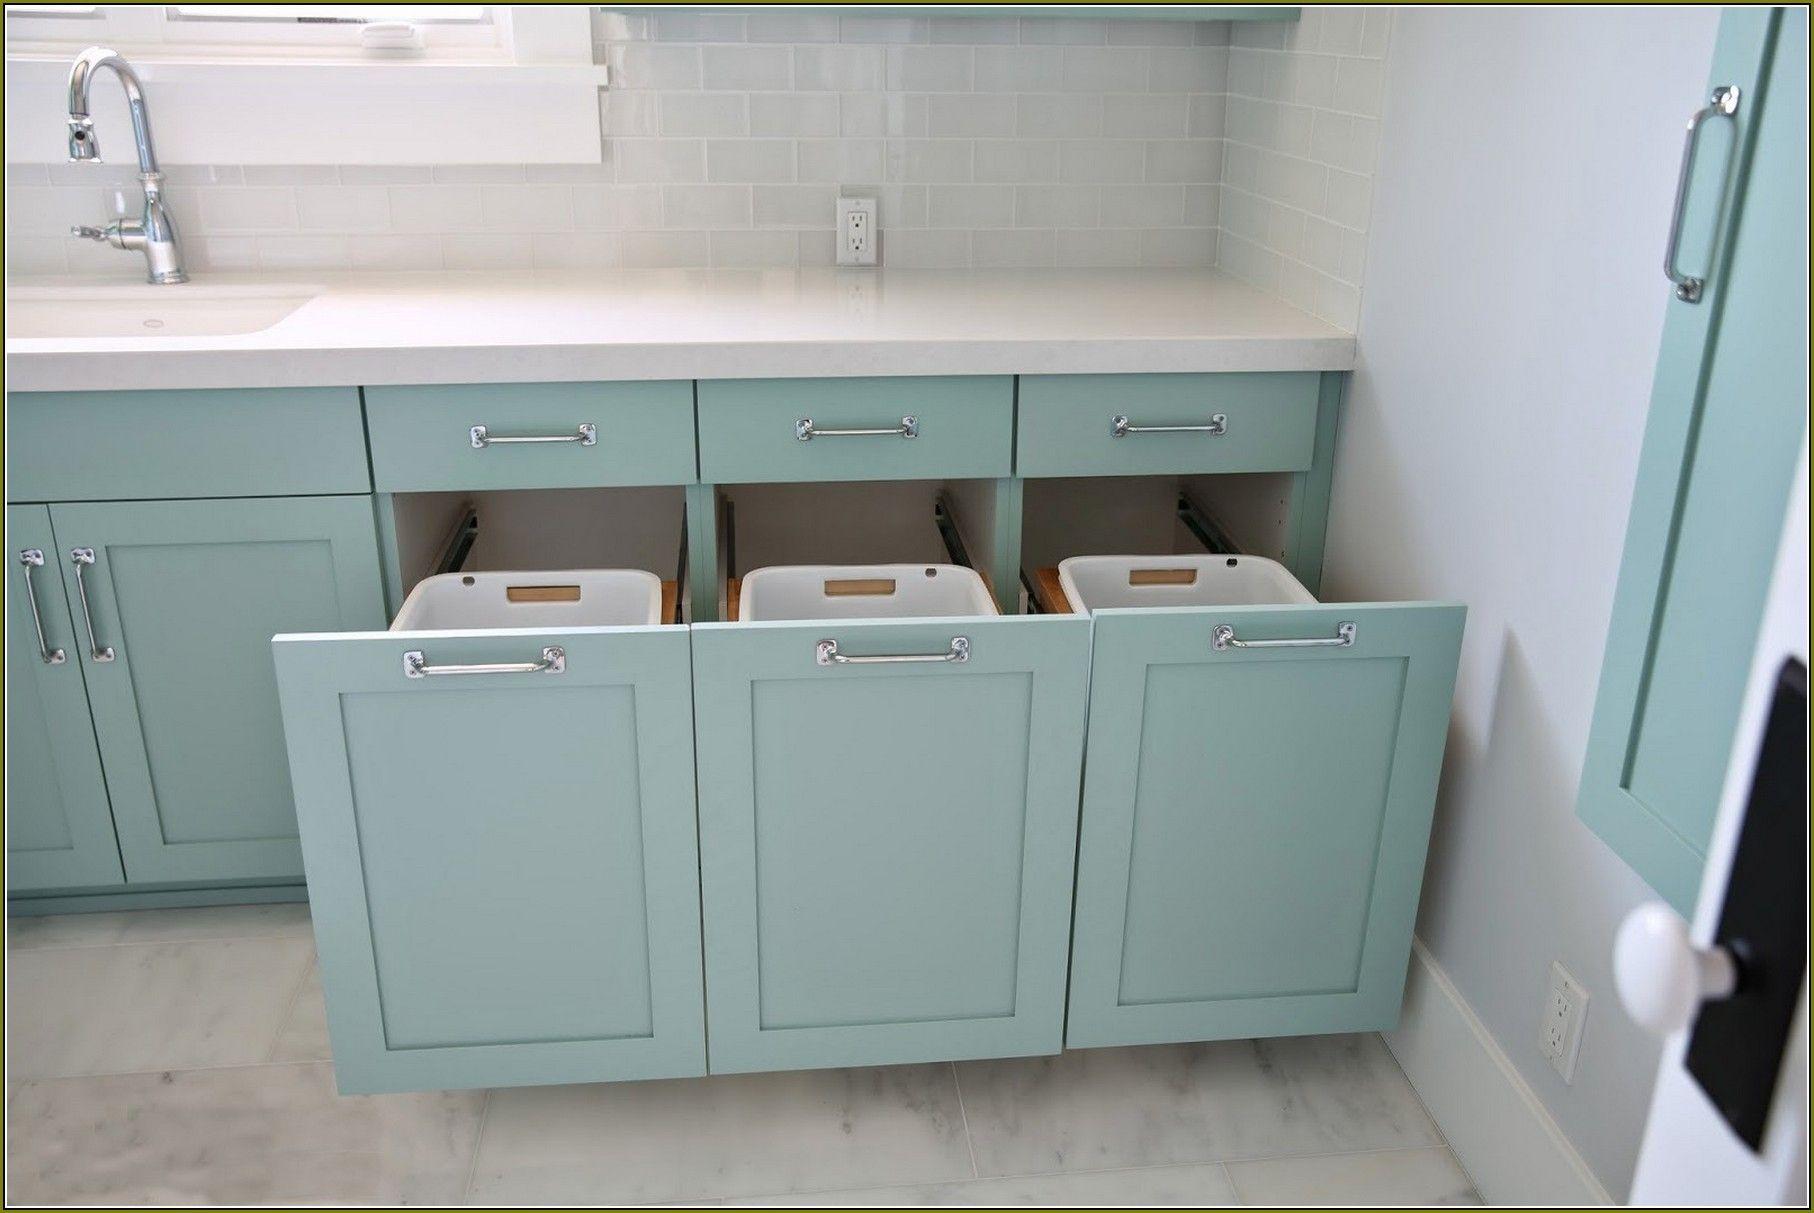 Corner Laundry Hamper Cabinet Laundry Hamper Laundry Room Cabinets Laundry Hamper Cabinet